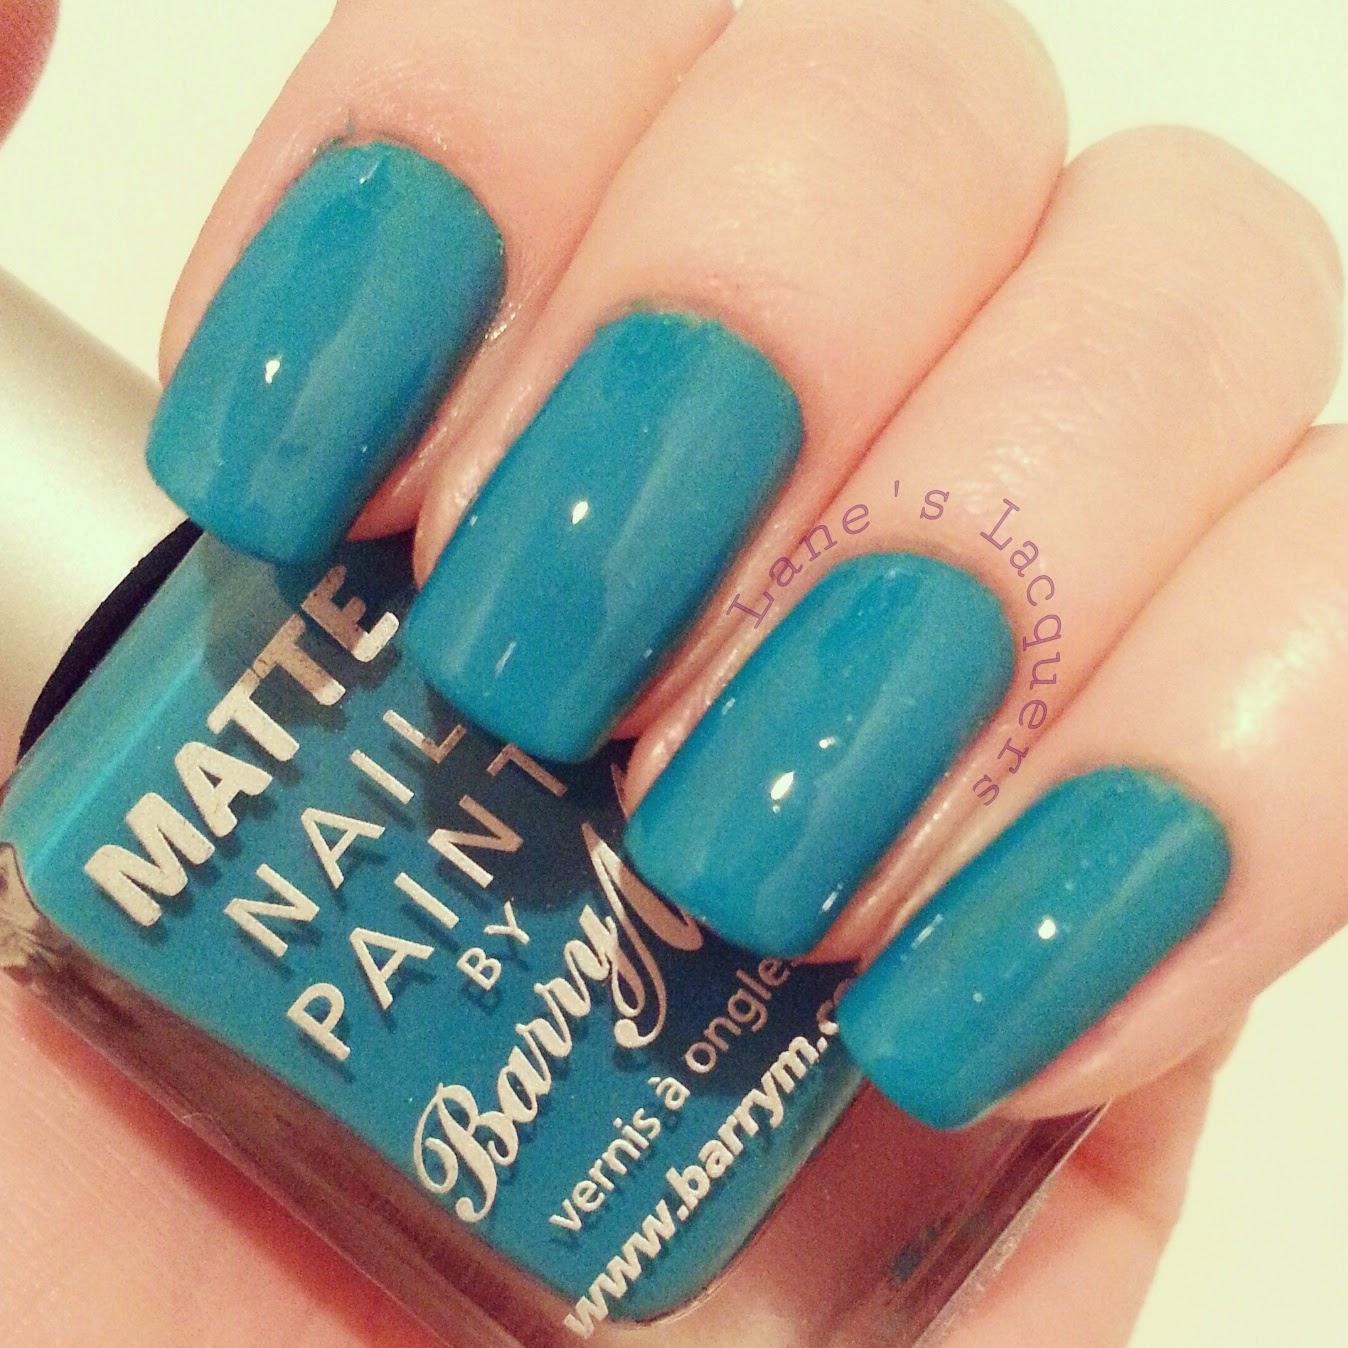 barry-m-cancun-swatch-manicure (3)